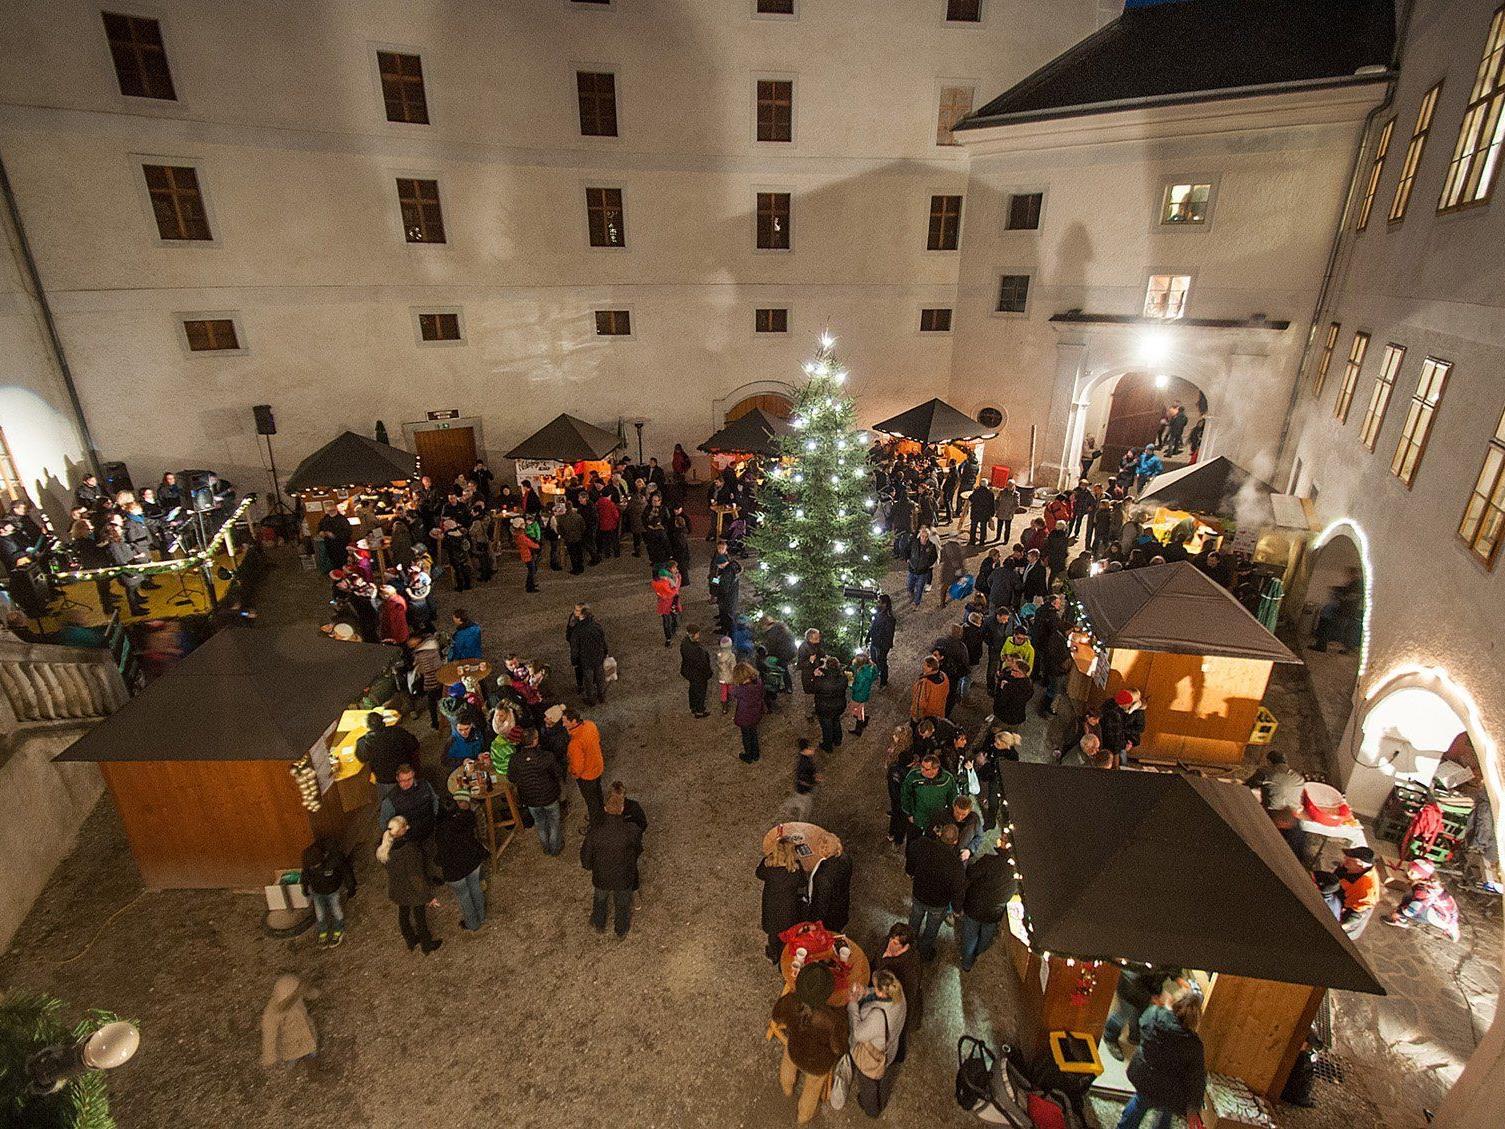 Adventmärkte in den Schlössern entlang der Donau entdecken.